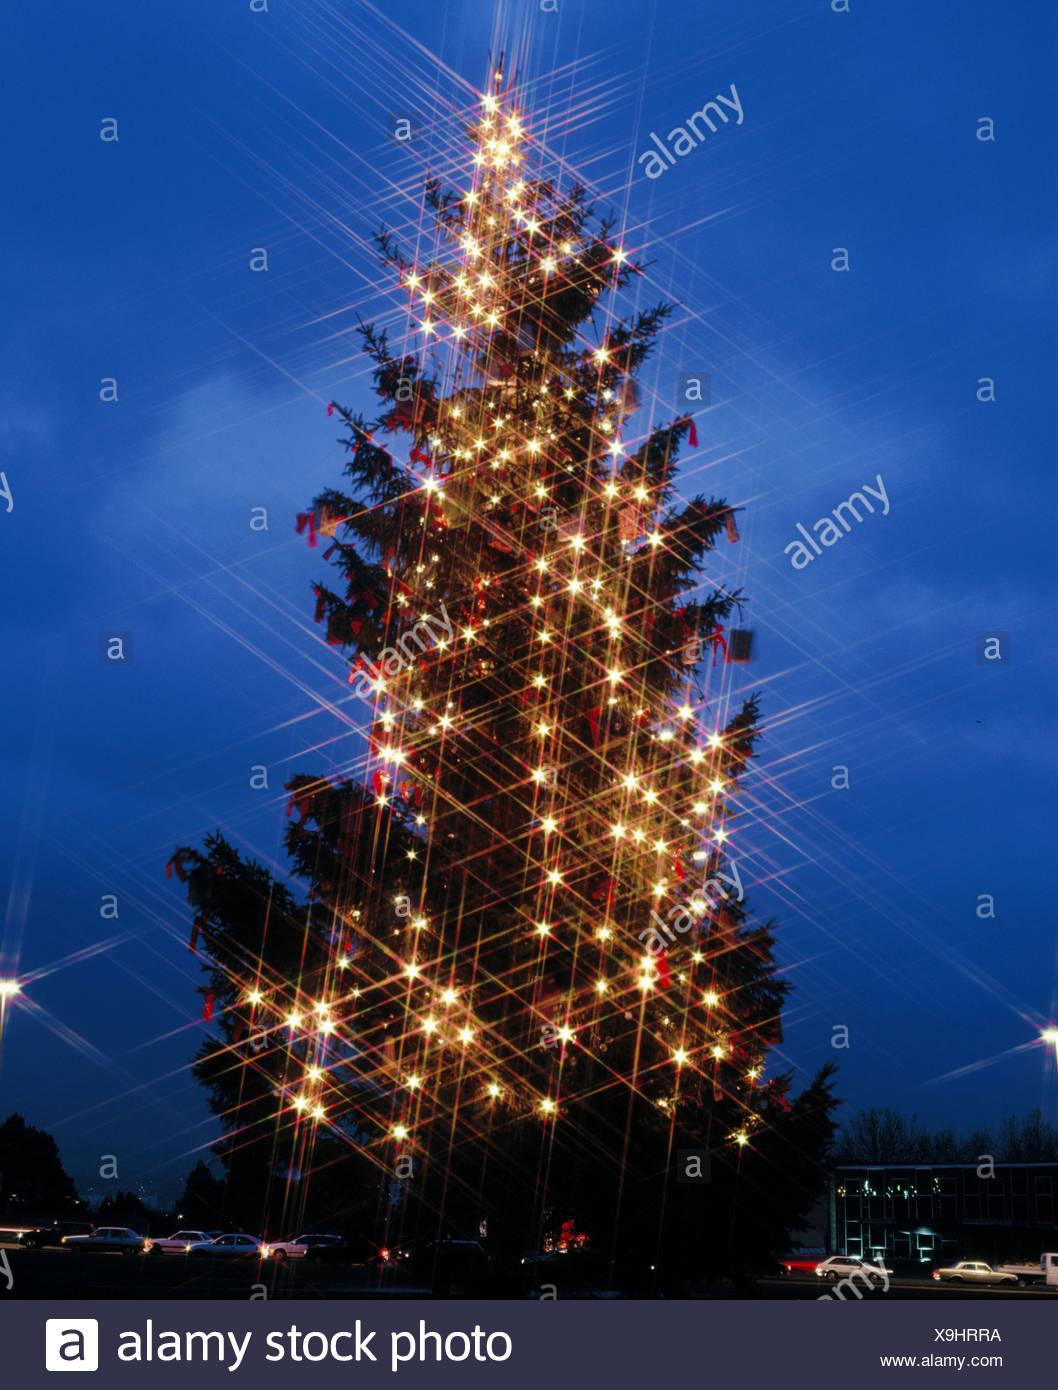 outside christmas tree germany europe friedrichs place kassel lights star grid filter christmas